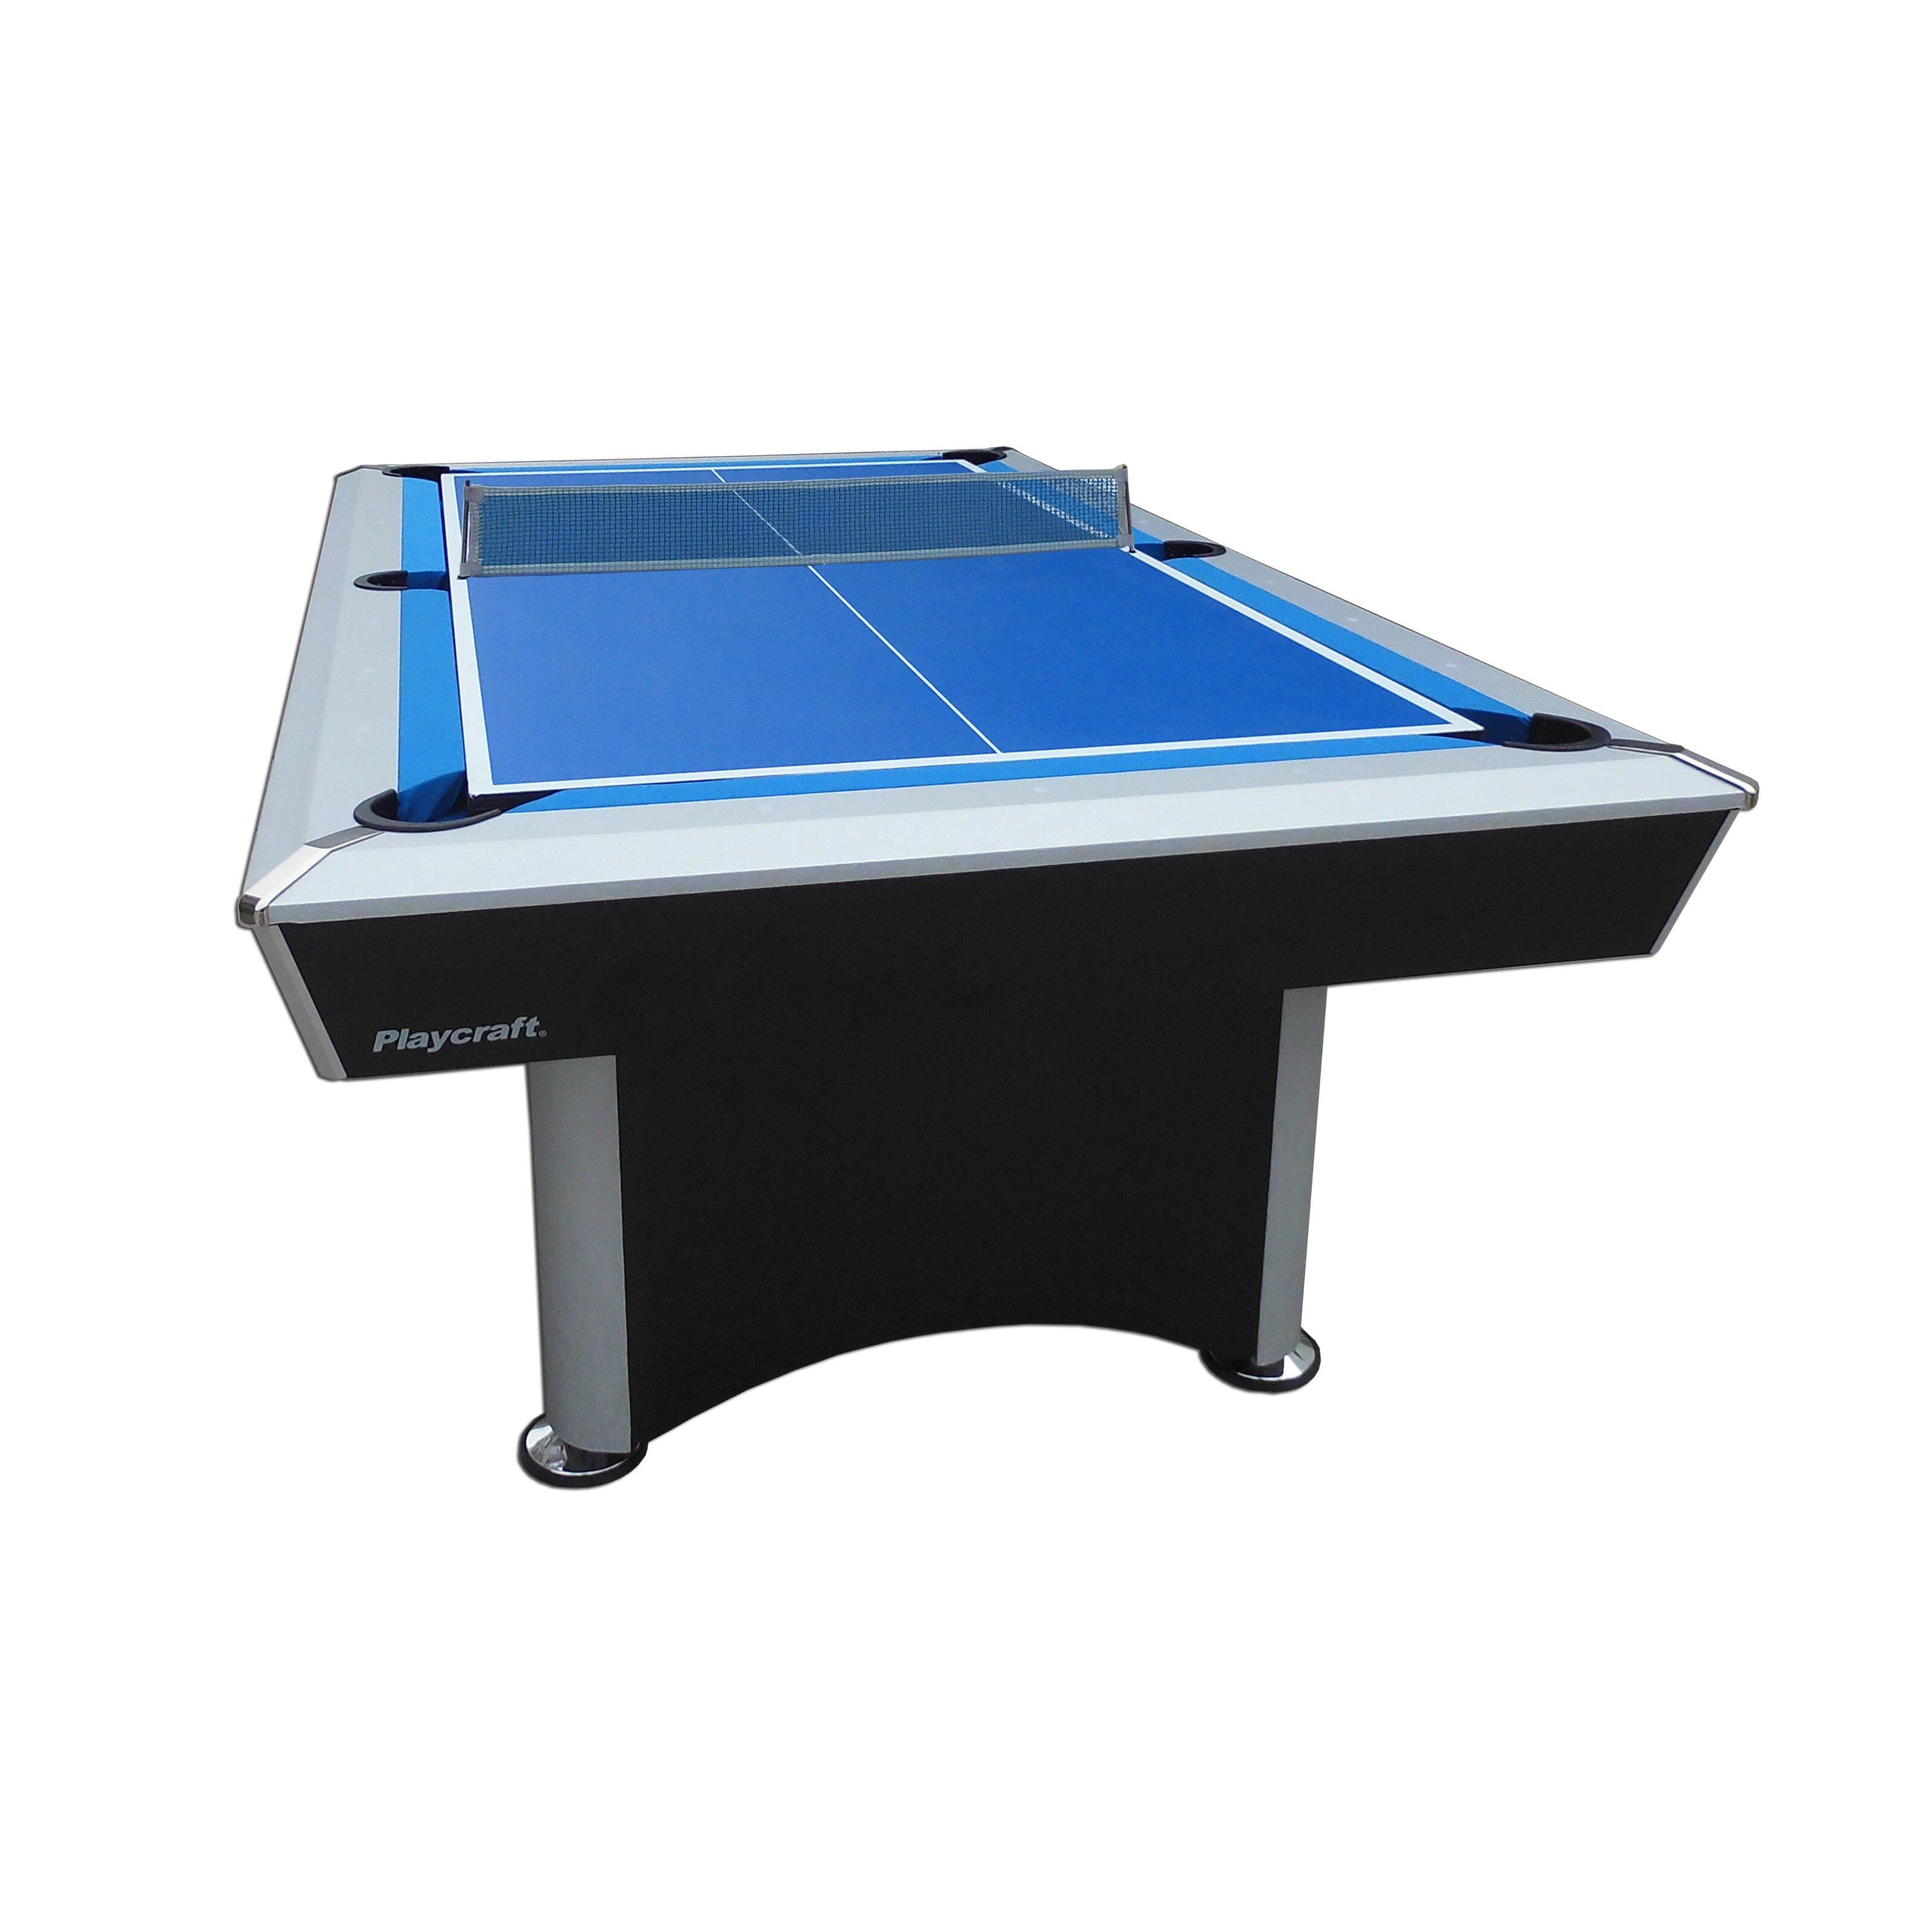 3 in 1 ping pong pool air hockey table - Playcraft 3 In 1 Sprint 7 Pool Table